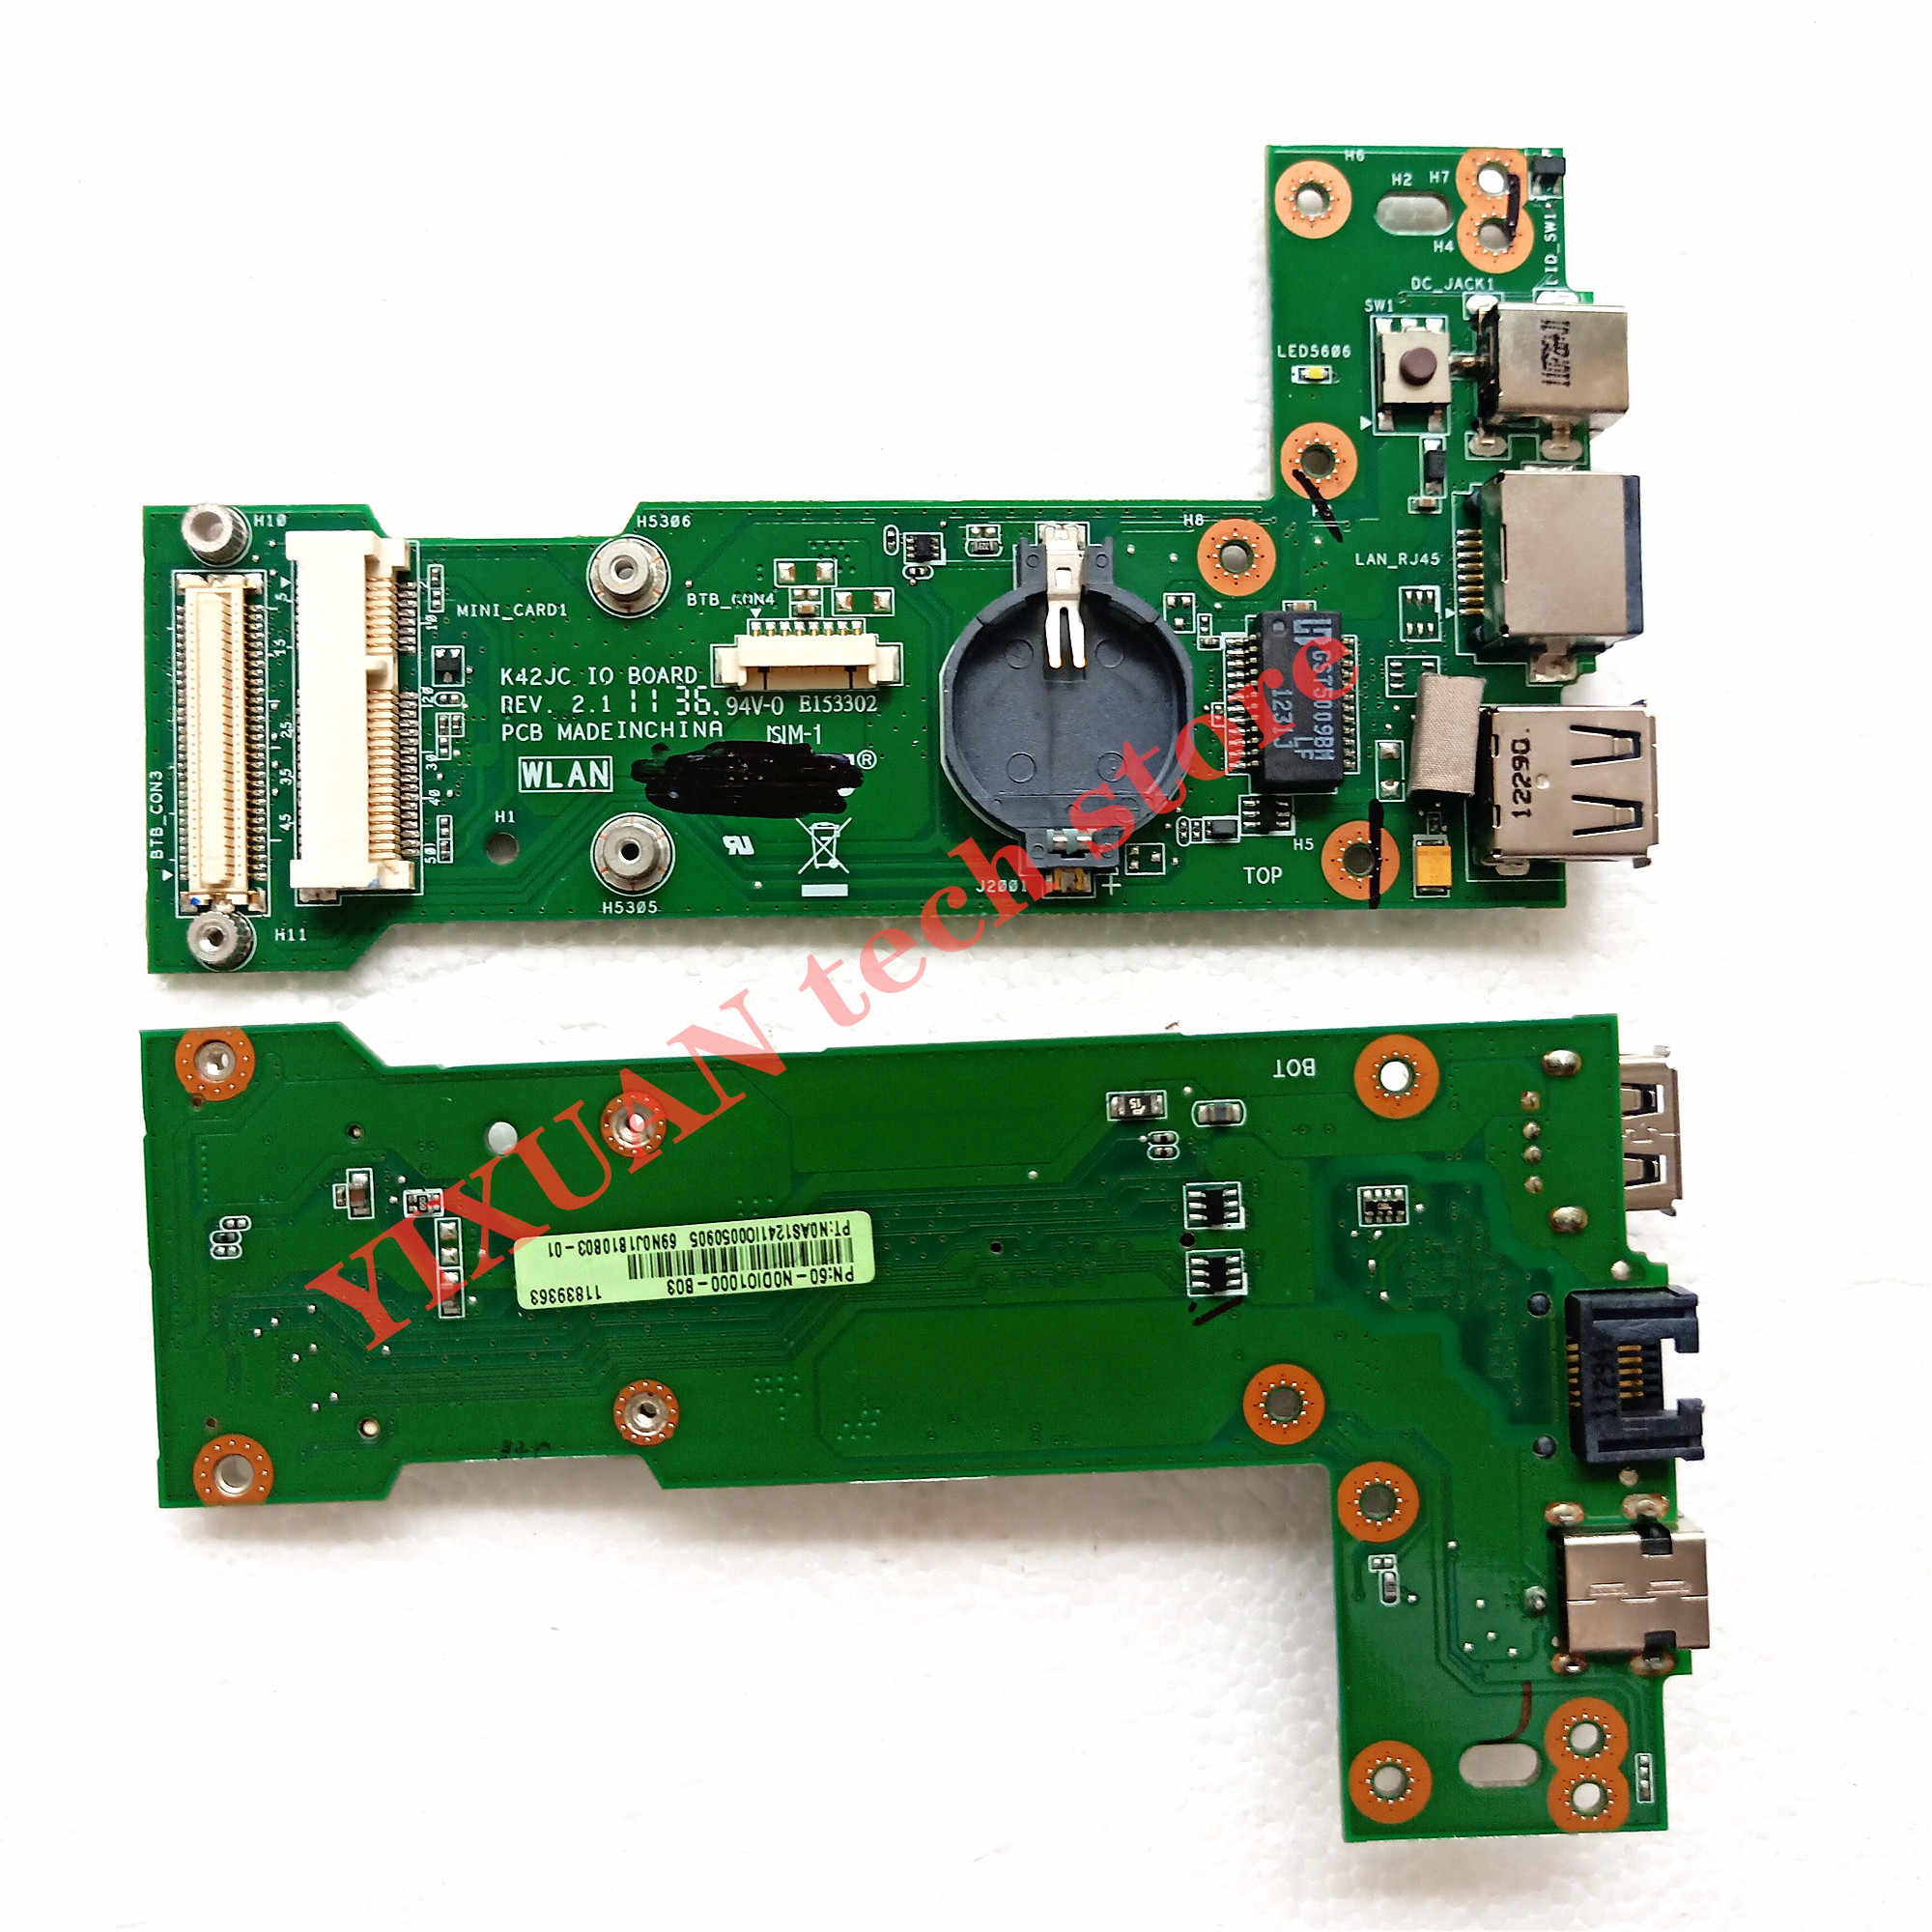 Brand new K42JC REV: 2.1 IO BOARD Per Asus K42J X42J A42J A40J K42JC K42JR K42JZ K42JY K42JV X42D K42D K42F POWER BOARD USB